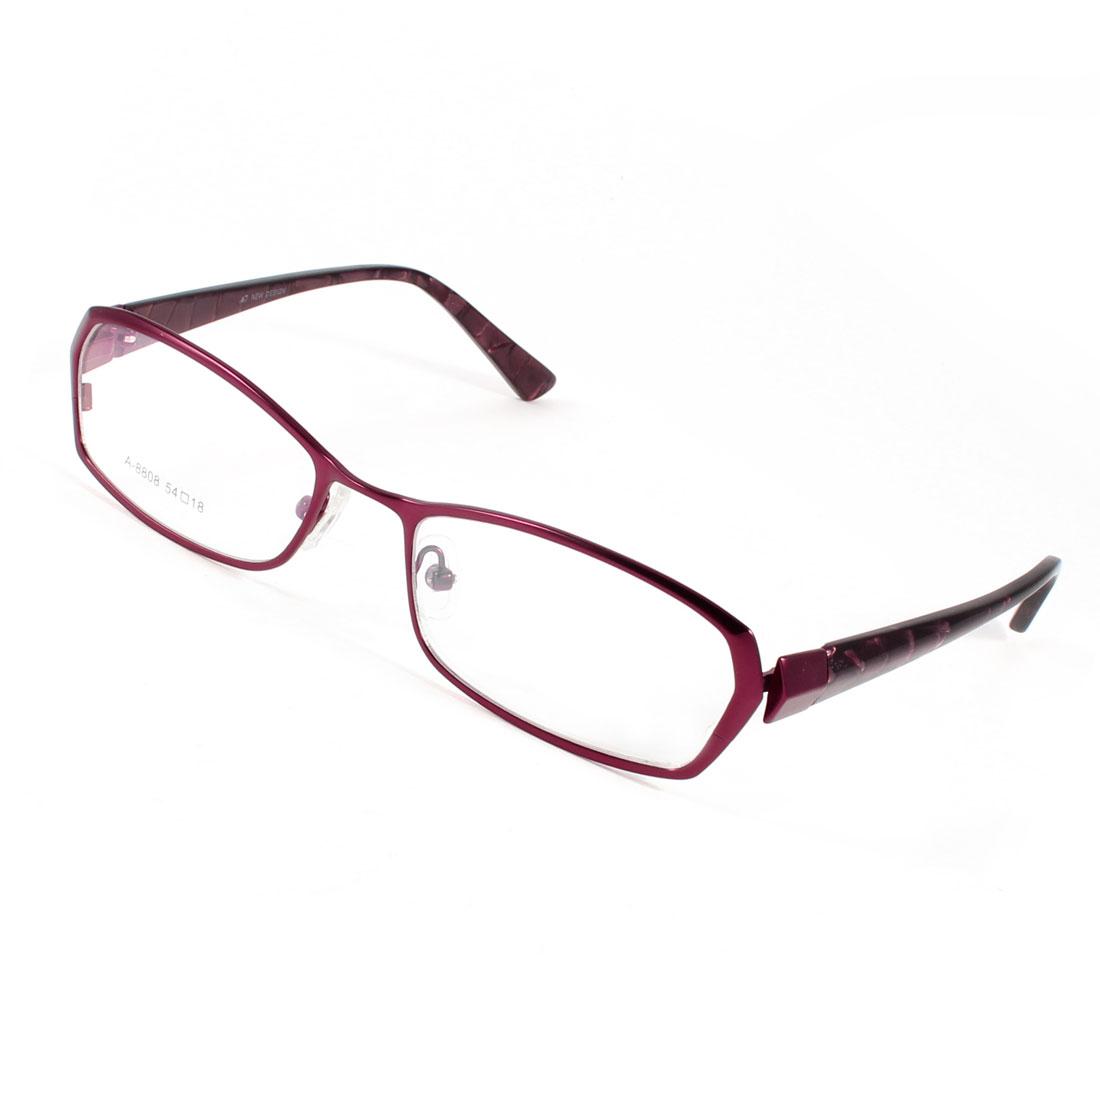 Unisex Plastic Rectangle Rim Burgundy Arm Nose Pads MC Lenses Plano Glasses